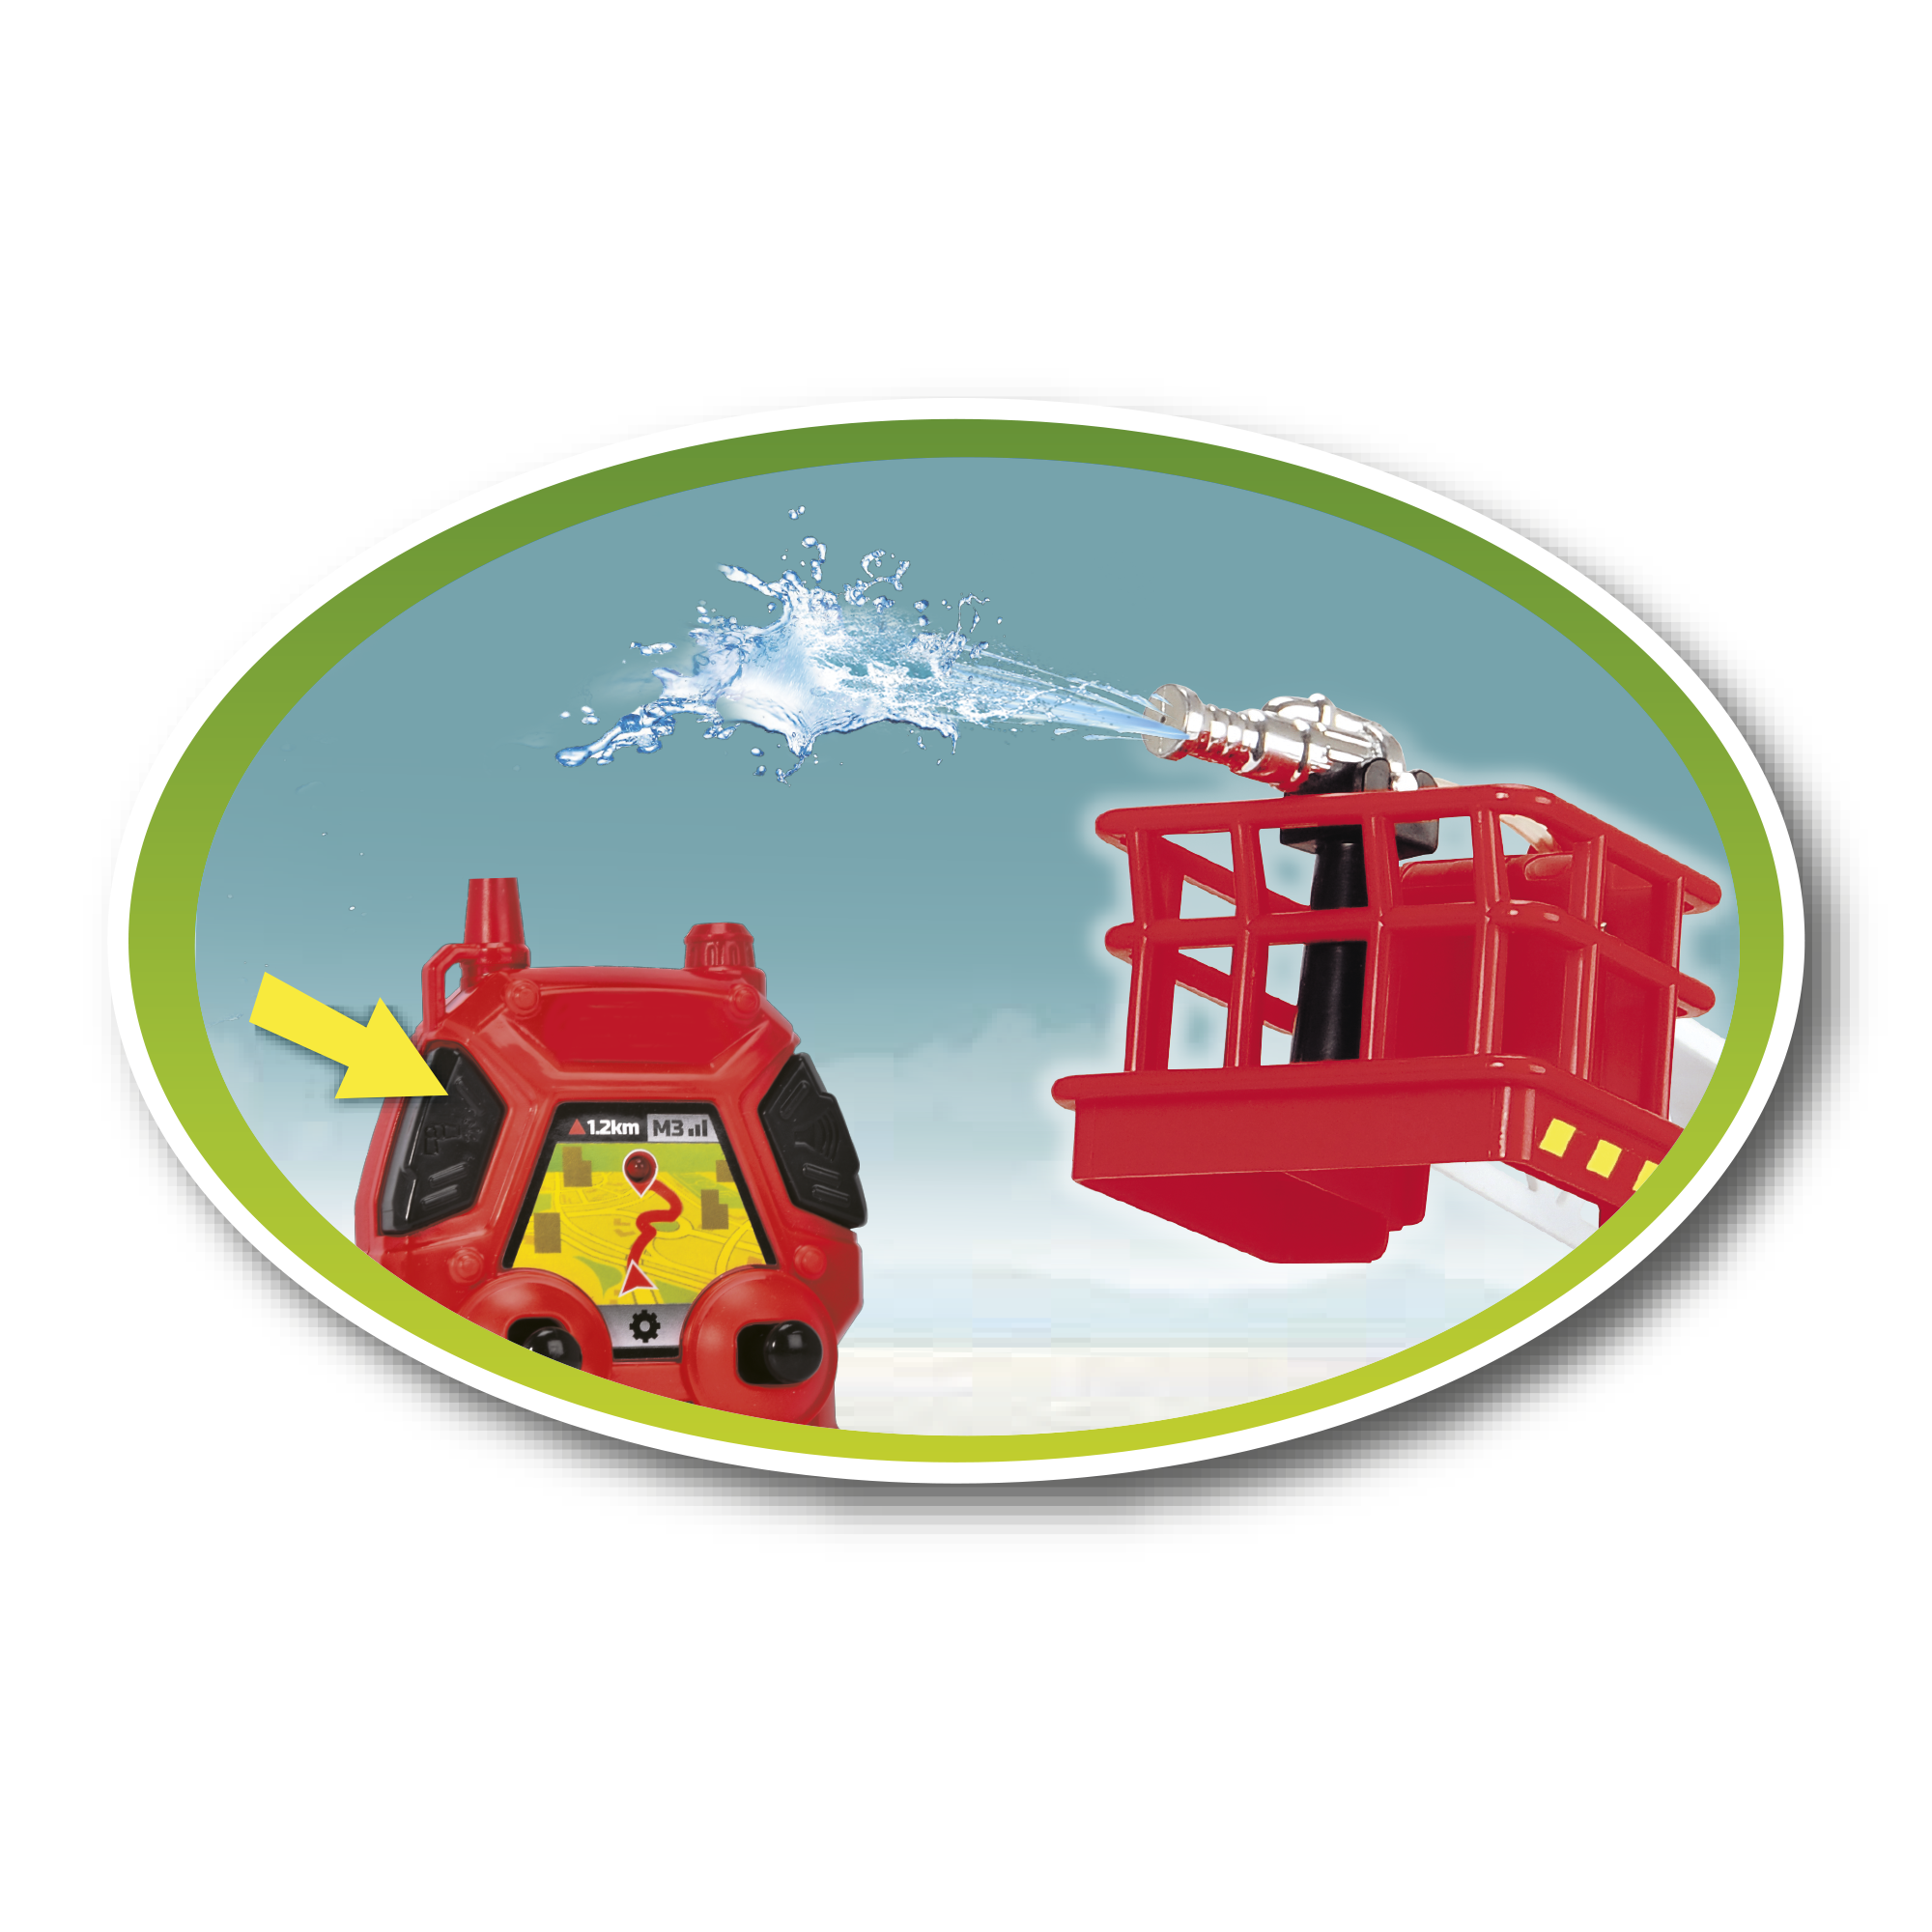 Camion dei pompieri - MOTOR&CO R/C